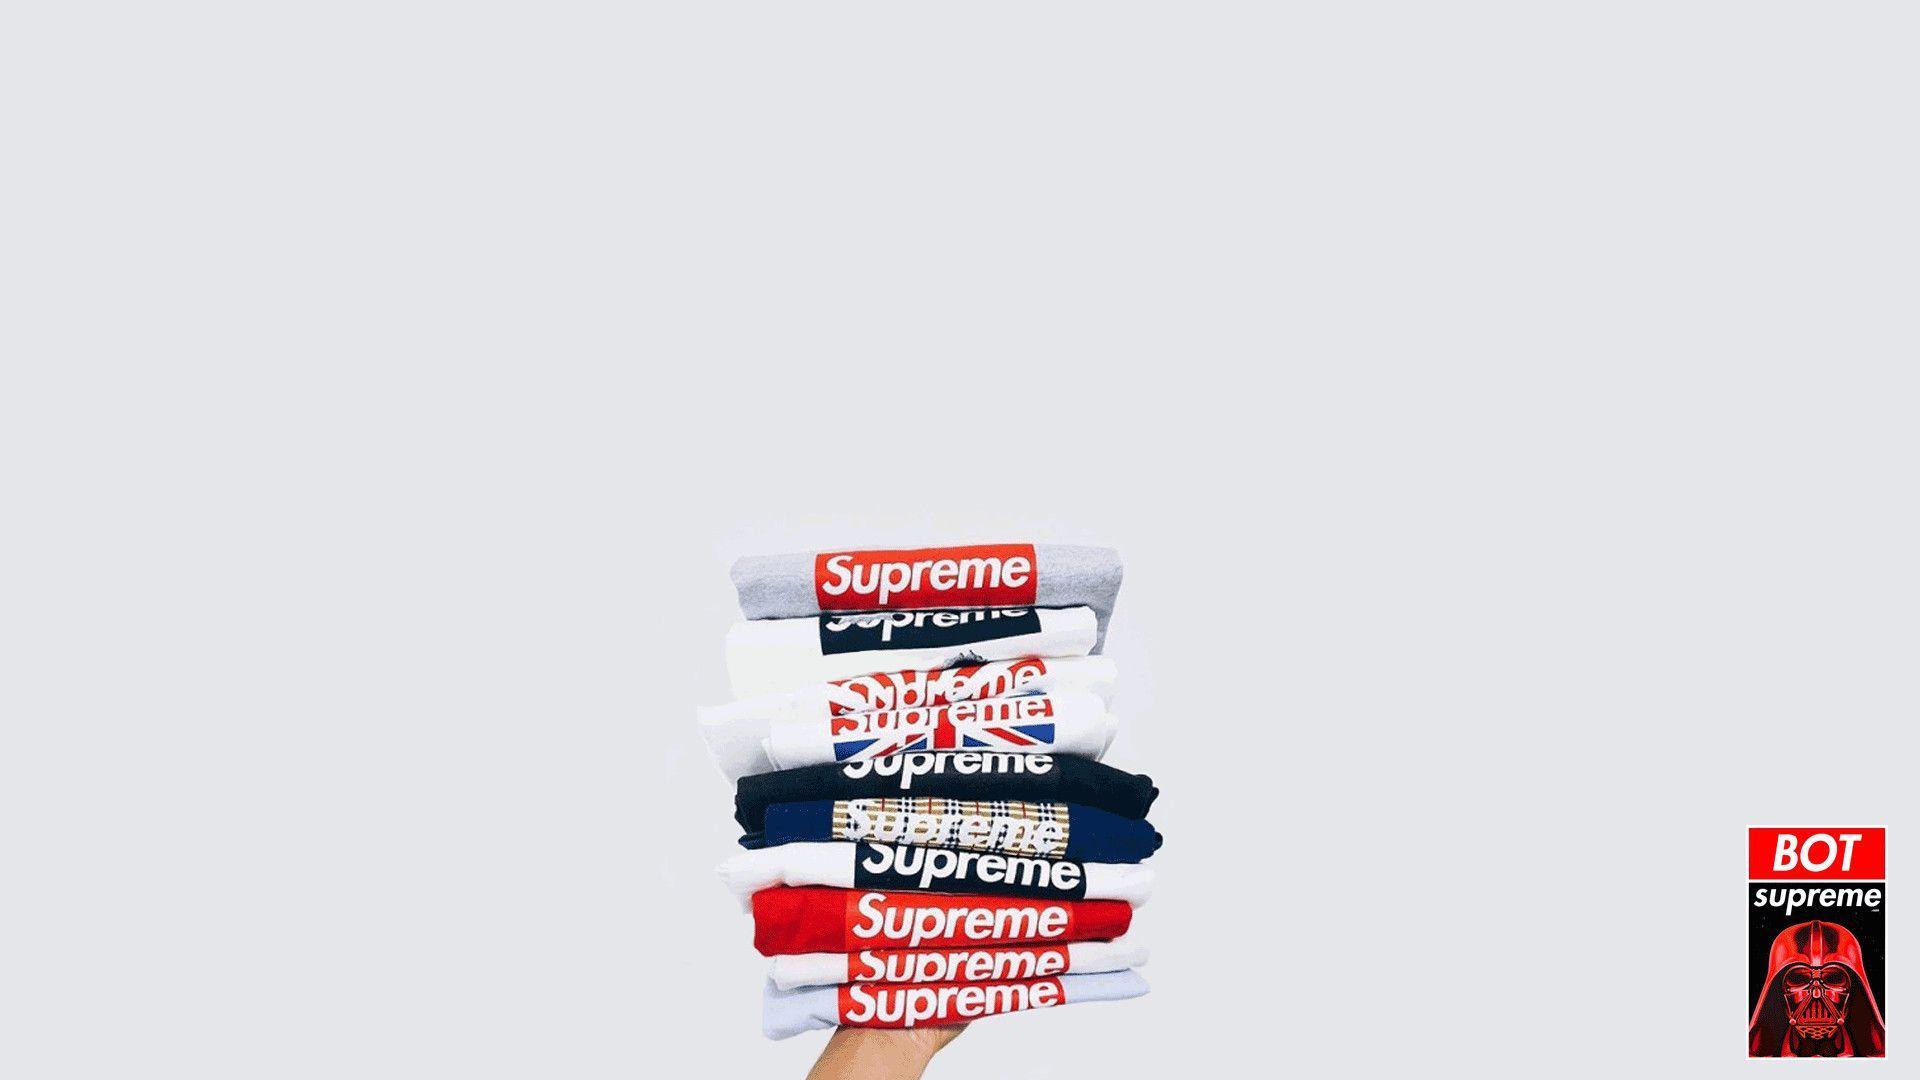 Supreme Wallpaper 4k Ipad Wallpapersimages Org